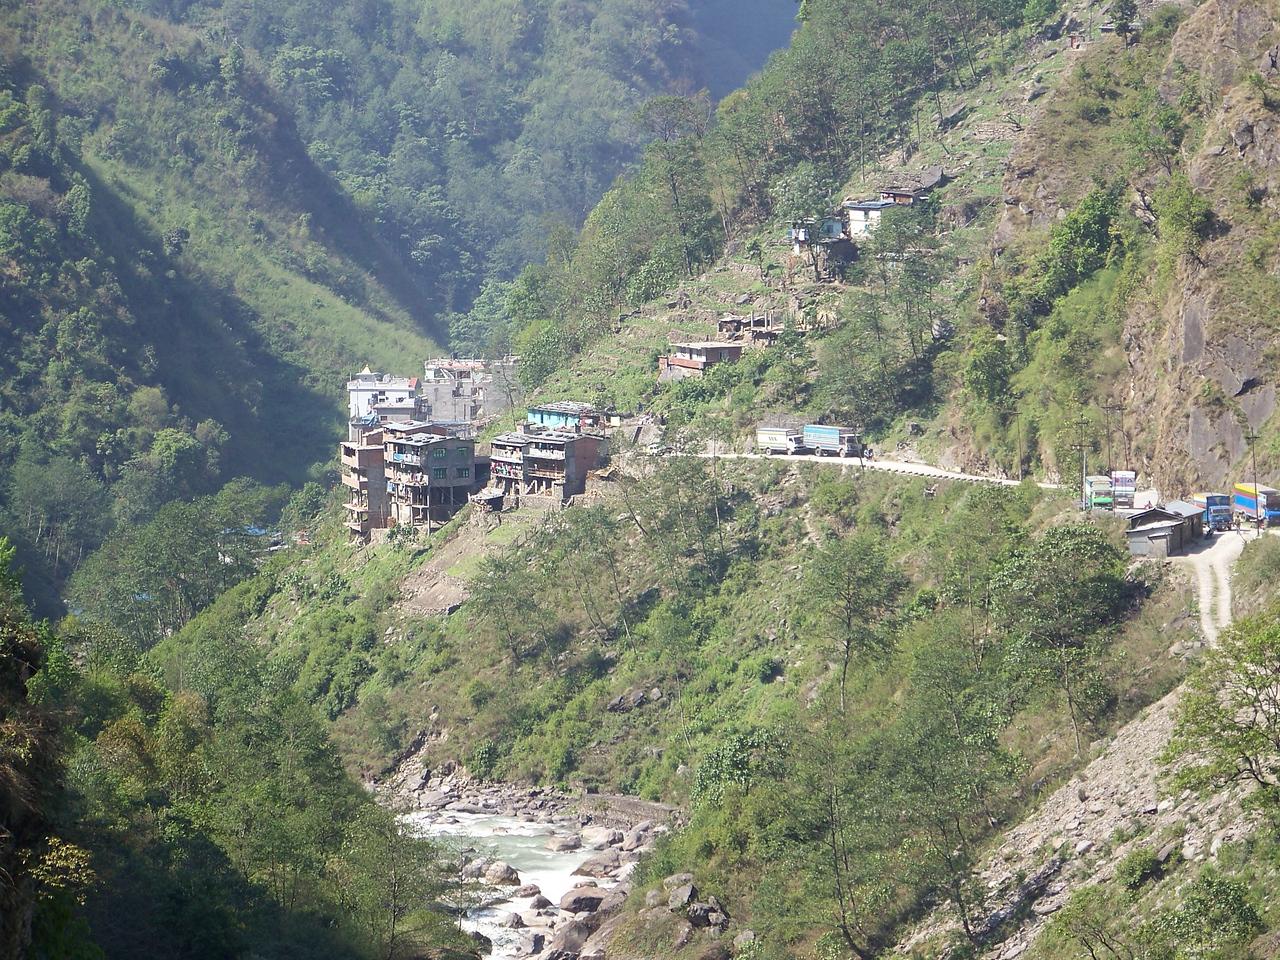 0634 - Scenery along Araniko Highway in Nepal Between Kodari and Katmandu - Nepal.JPG